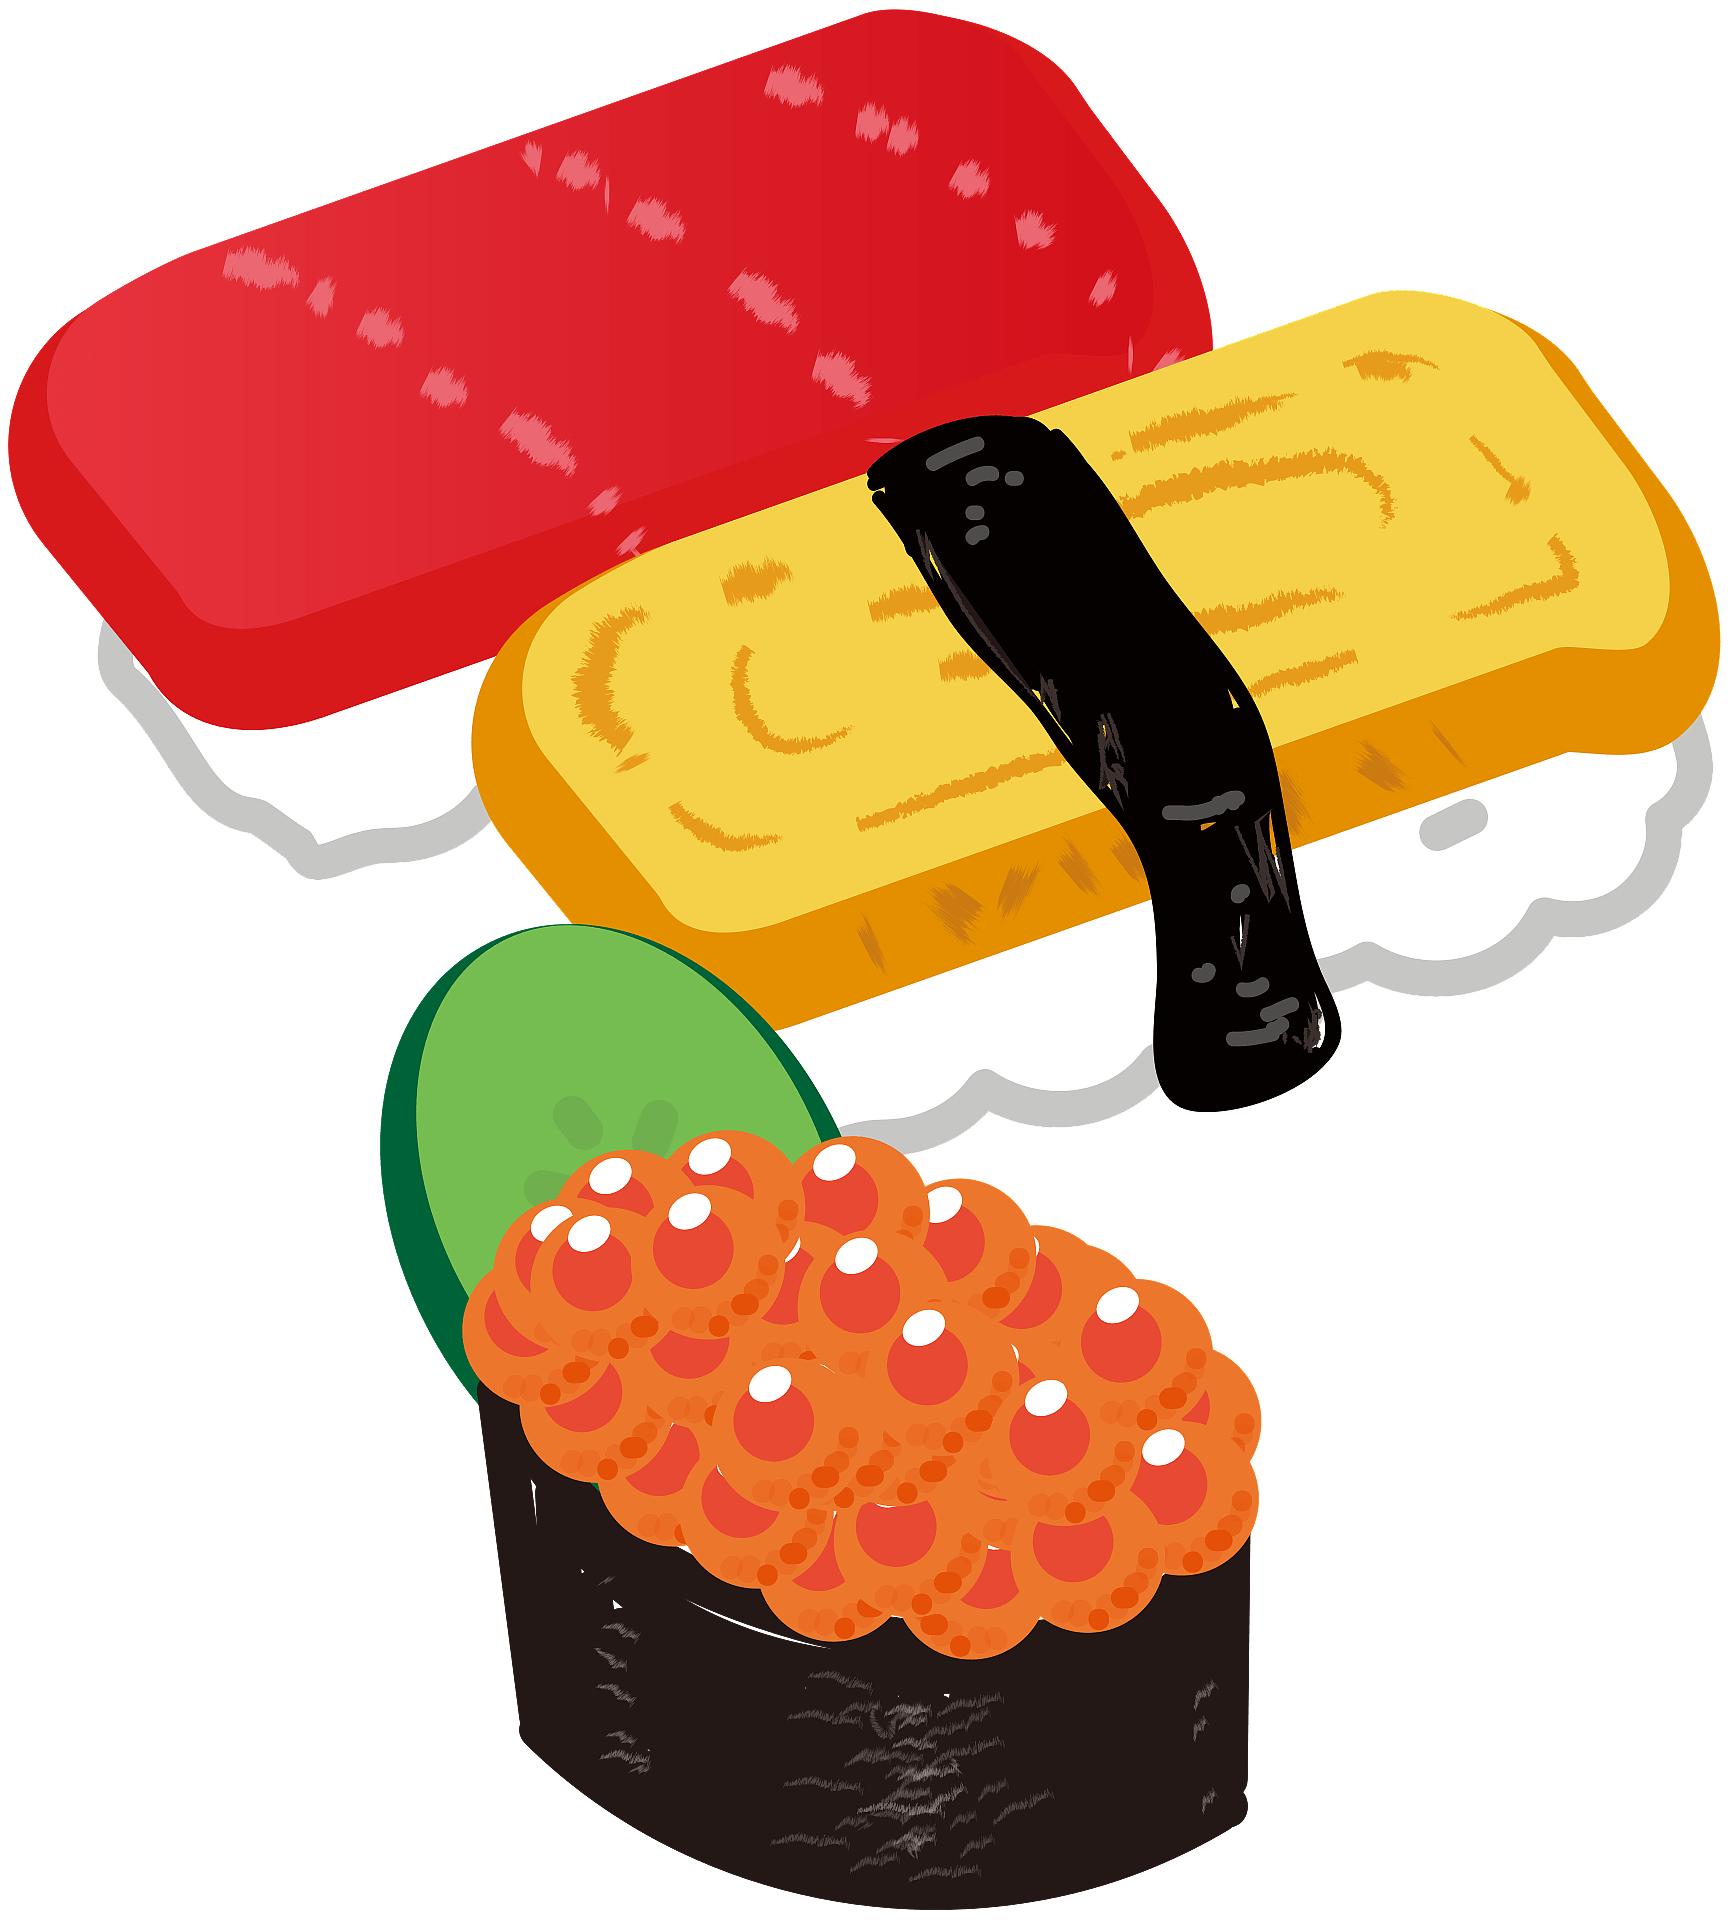 Clipart - Sushi Clipart, HD Png Download , Transparent Png Image - PNGitem